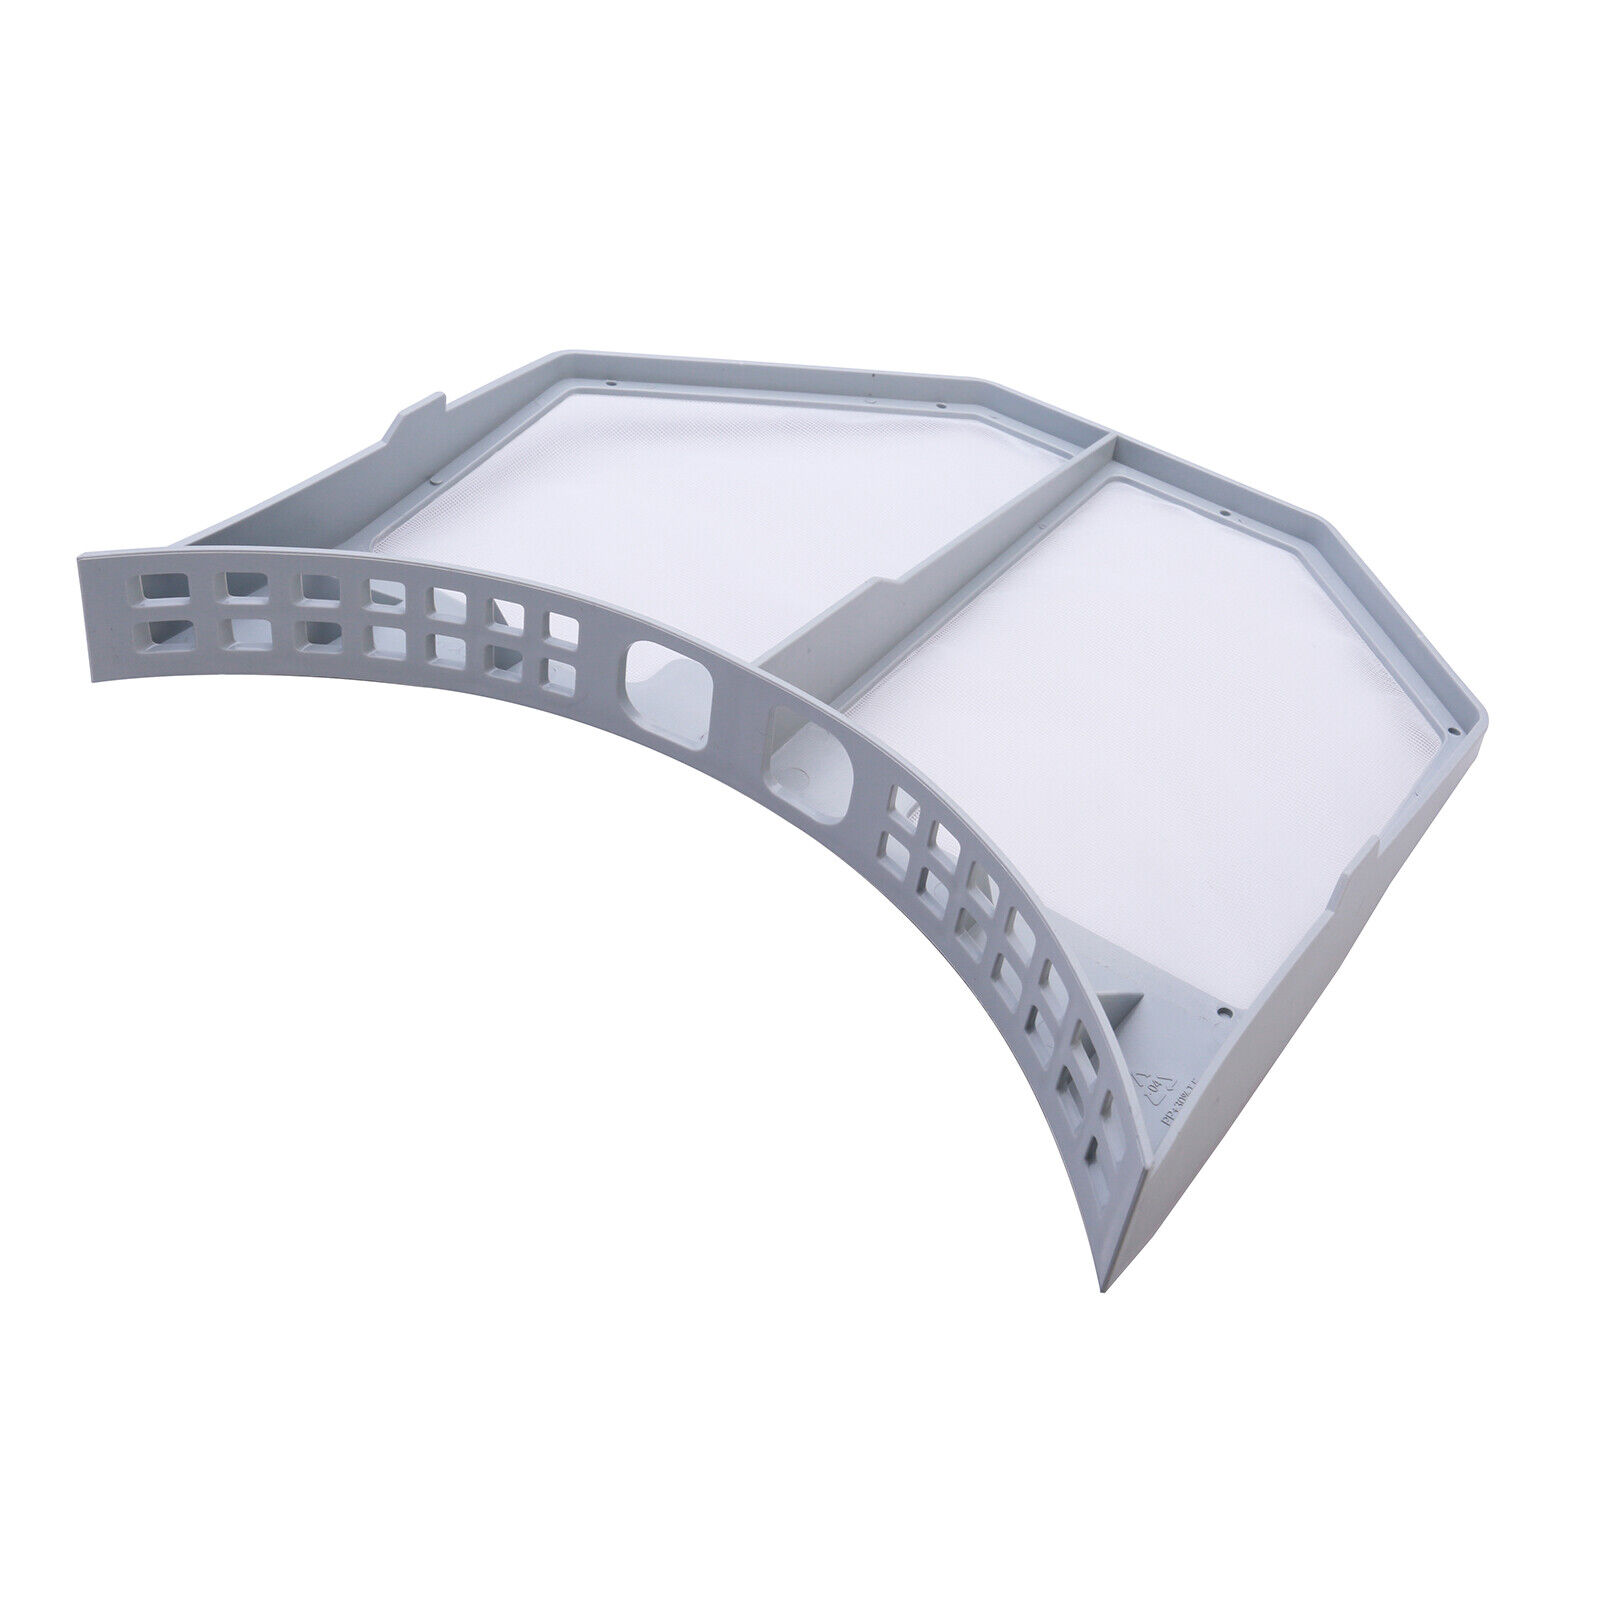 Hotpoint CREDA Indesit Proline Original Secadora Fluff Filtro De Pelusas c00207652